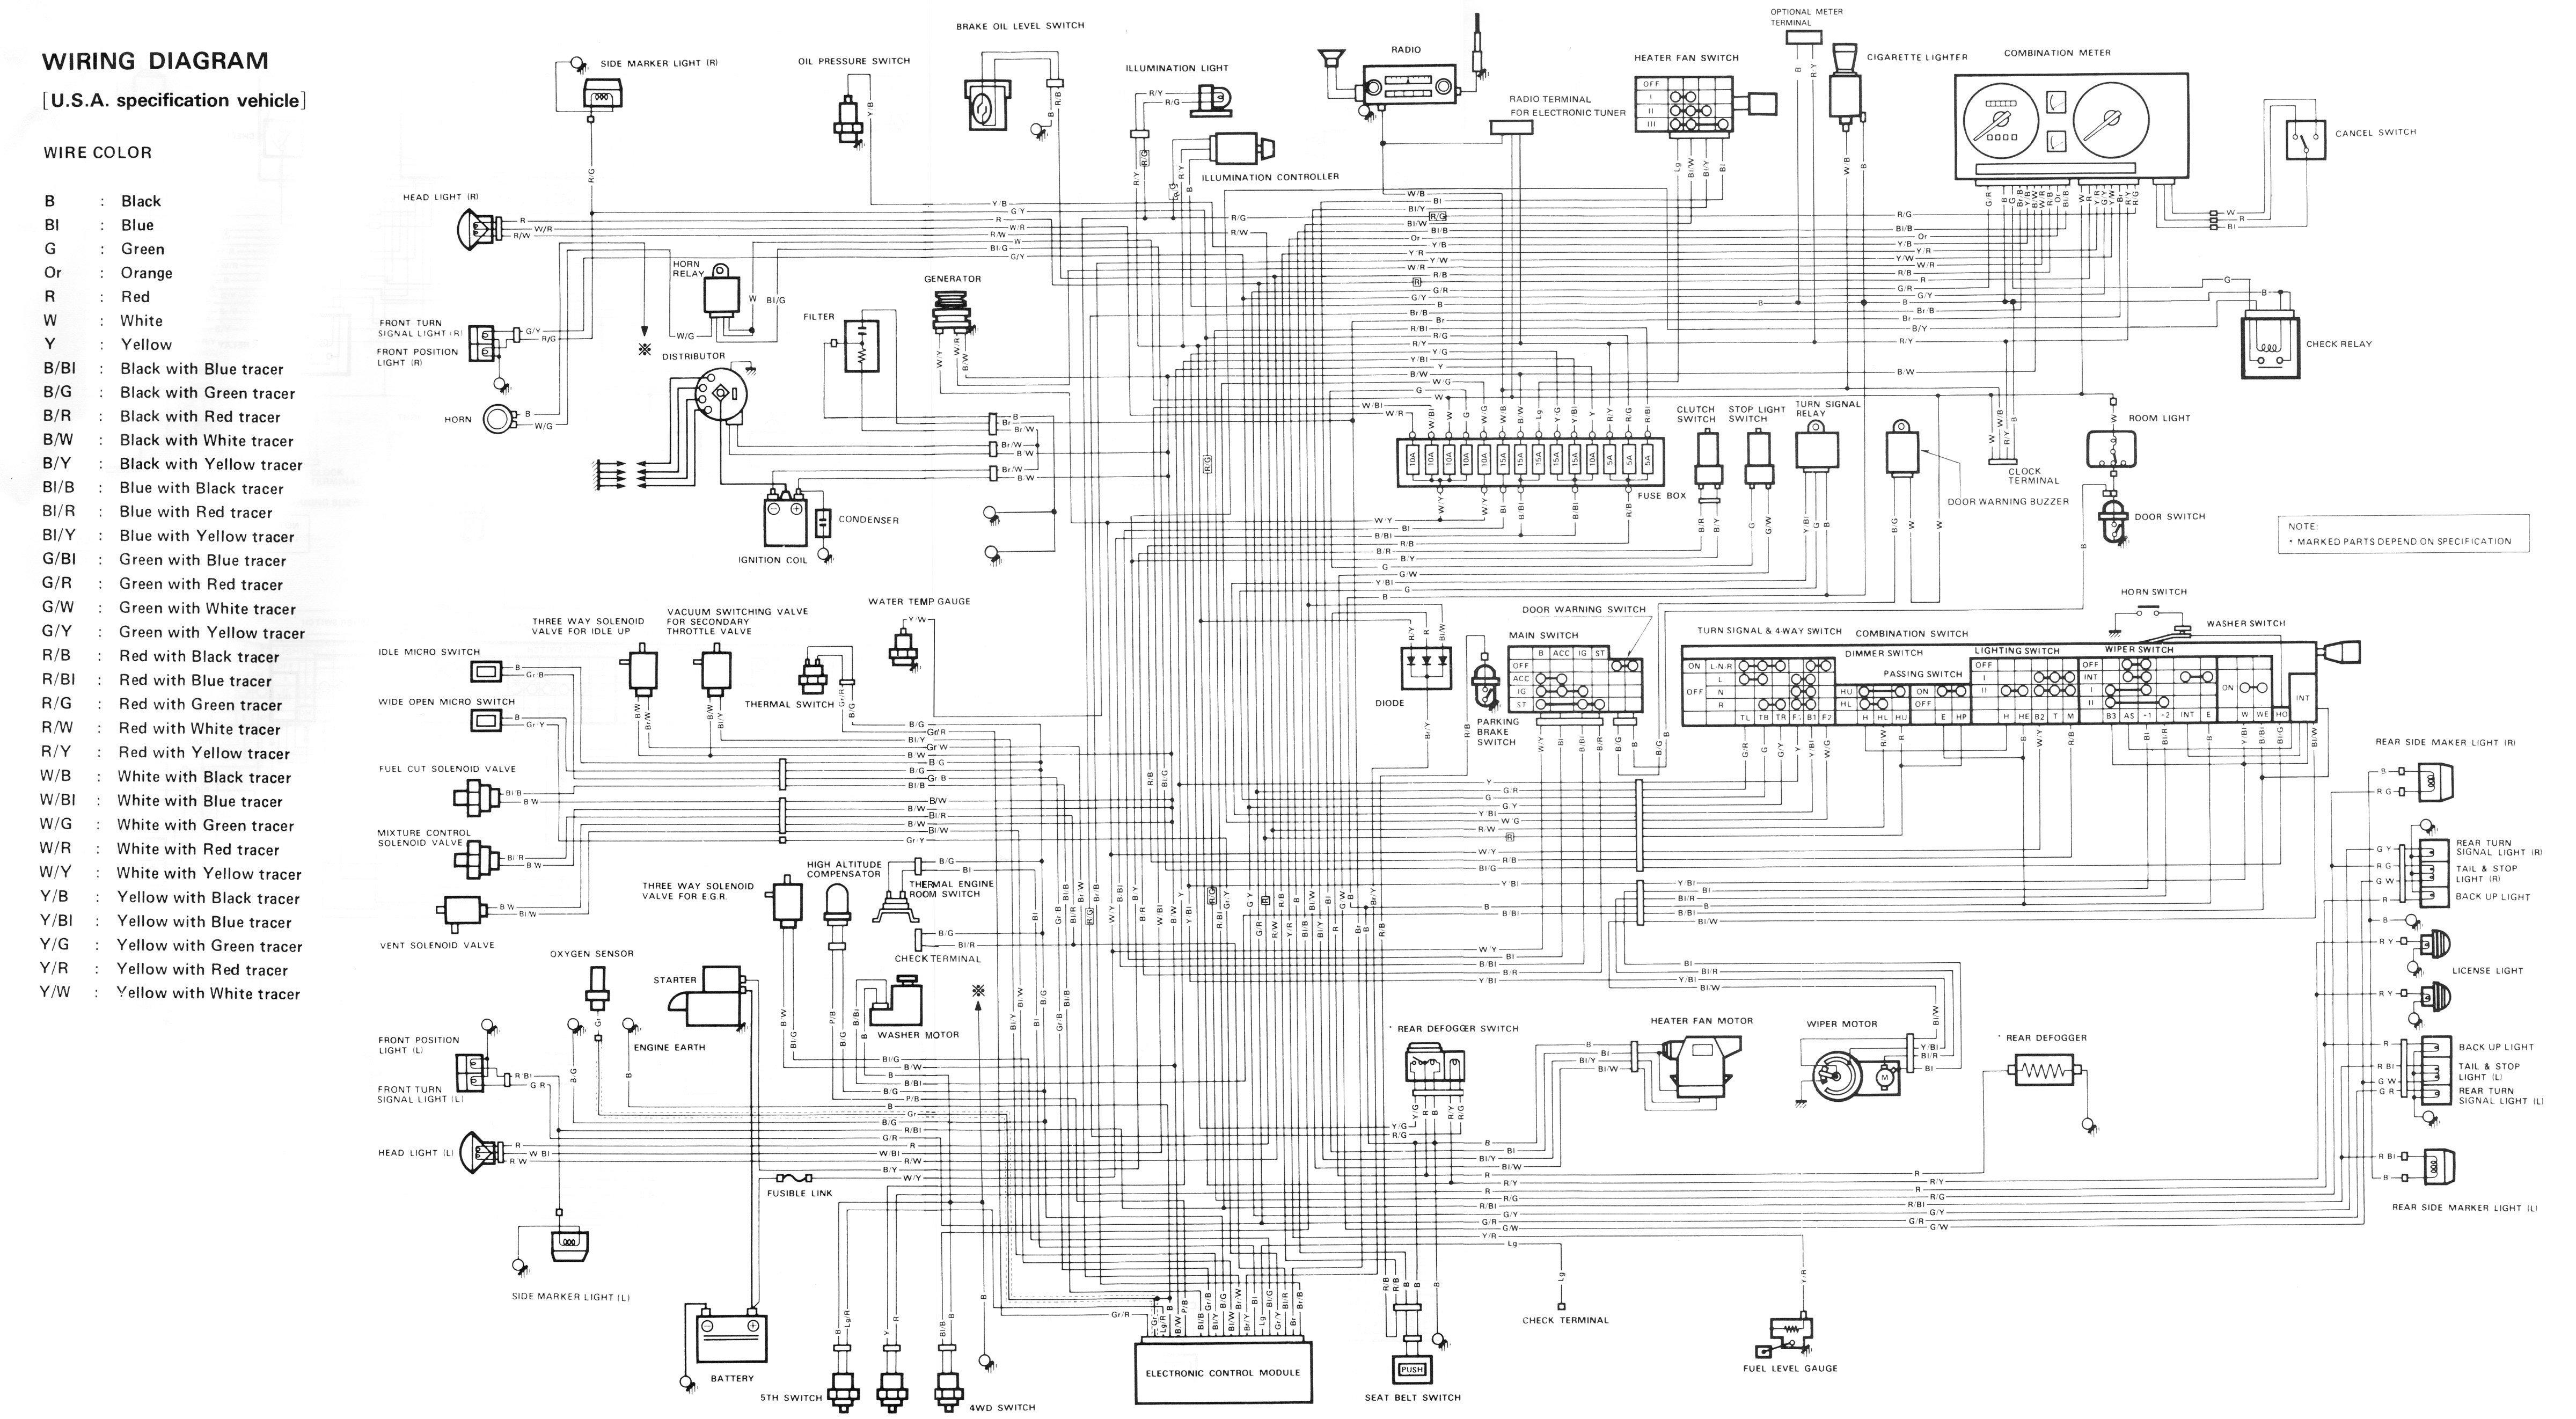 sf_9199] wiring diagram besides fuel pump wiring diagram further ... suzuki samurai fuel pump relay wiring diagram  aeocy wned ponge romet dness xortanet emba mohammedshrine librar ...